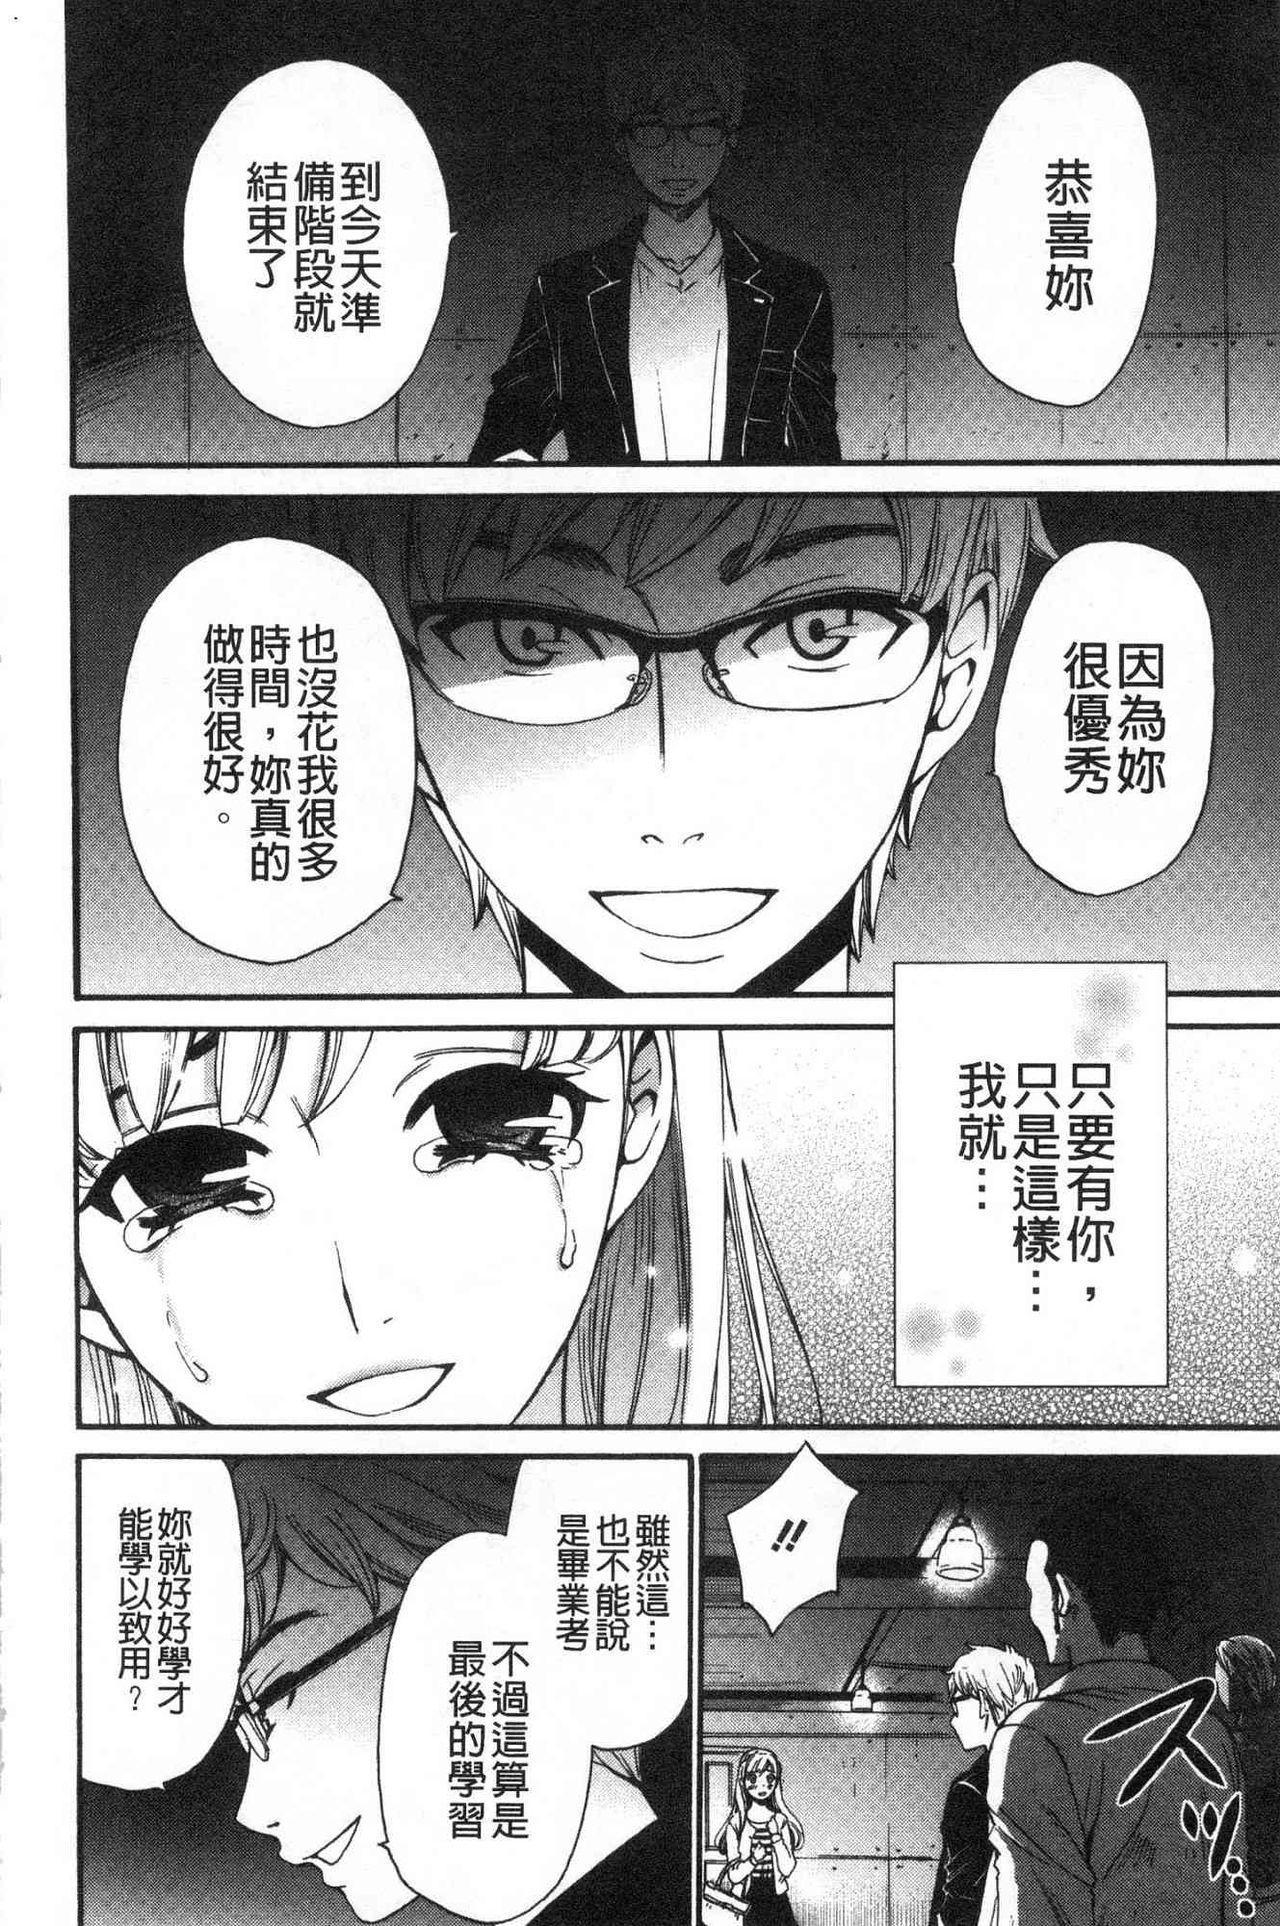 [Gotoh Akira]  21-ji no Onna ~Camera no Mae no Mesuinu~ 2 | 21時之女 ~鏡頭前的牝犬~ 2 [Chinese] 81